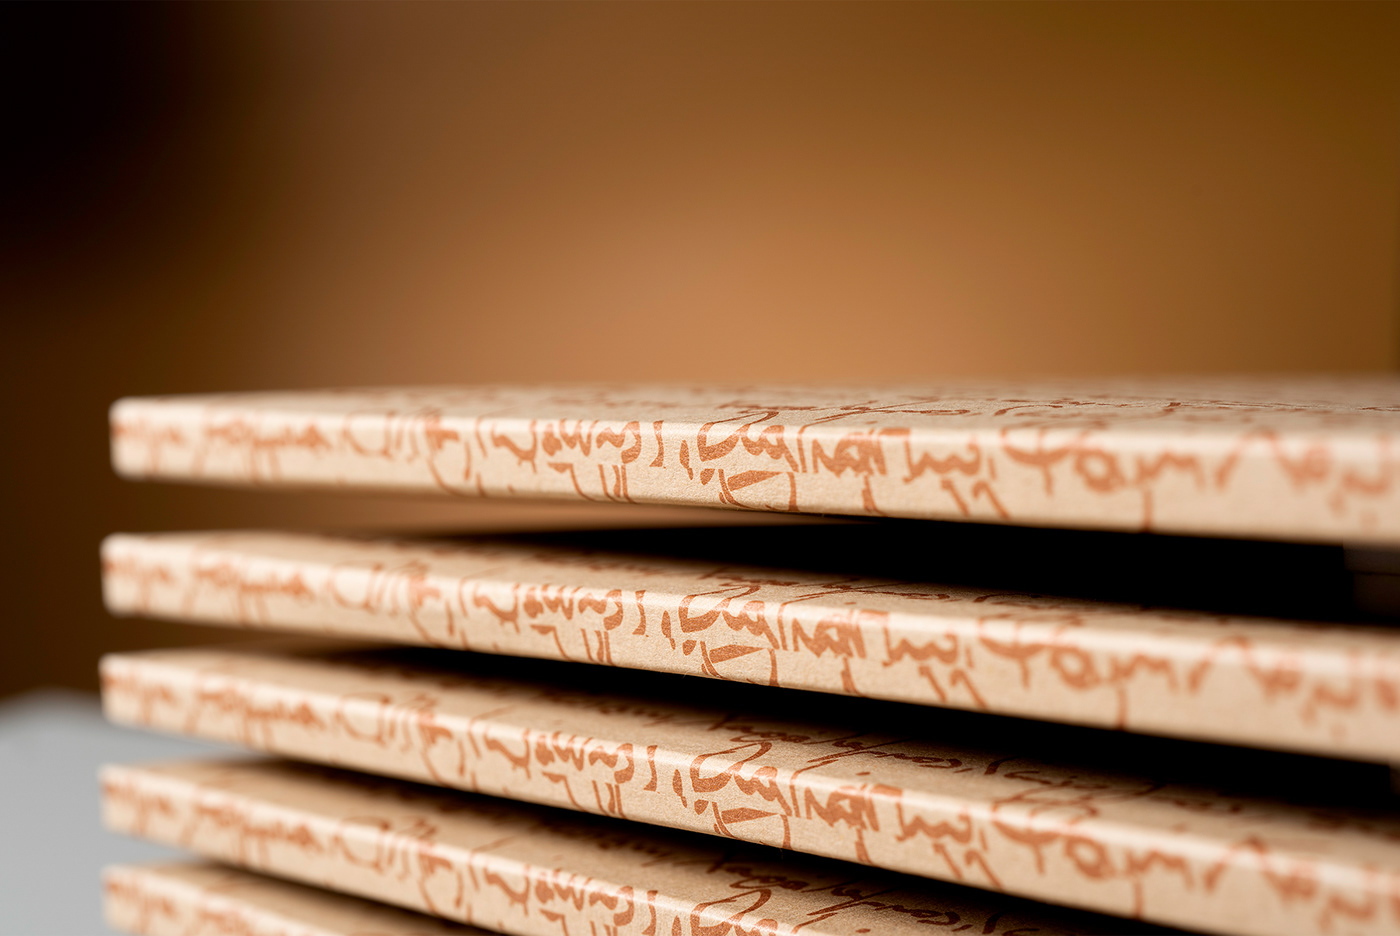 Image may contain: book, stack and handwriting